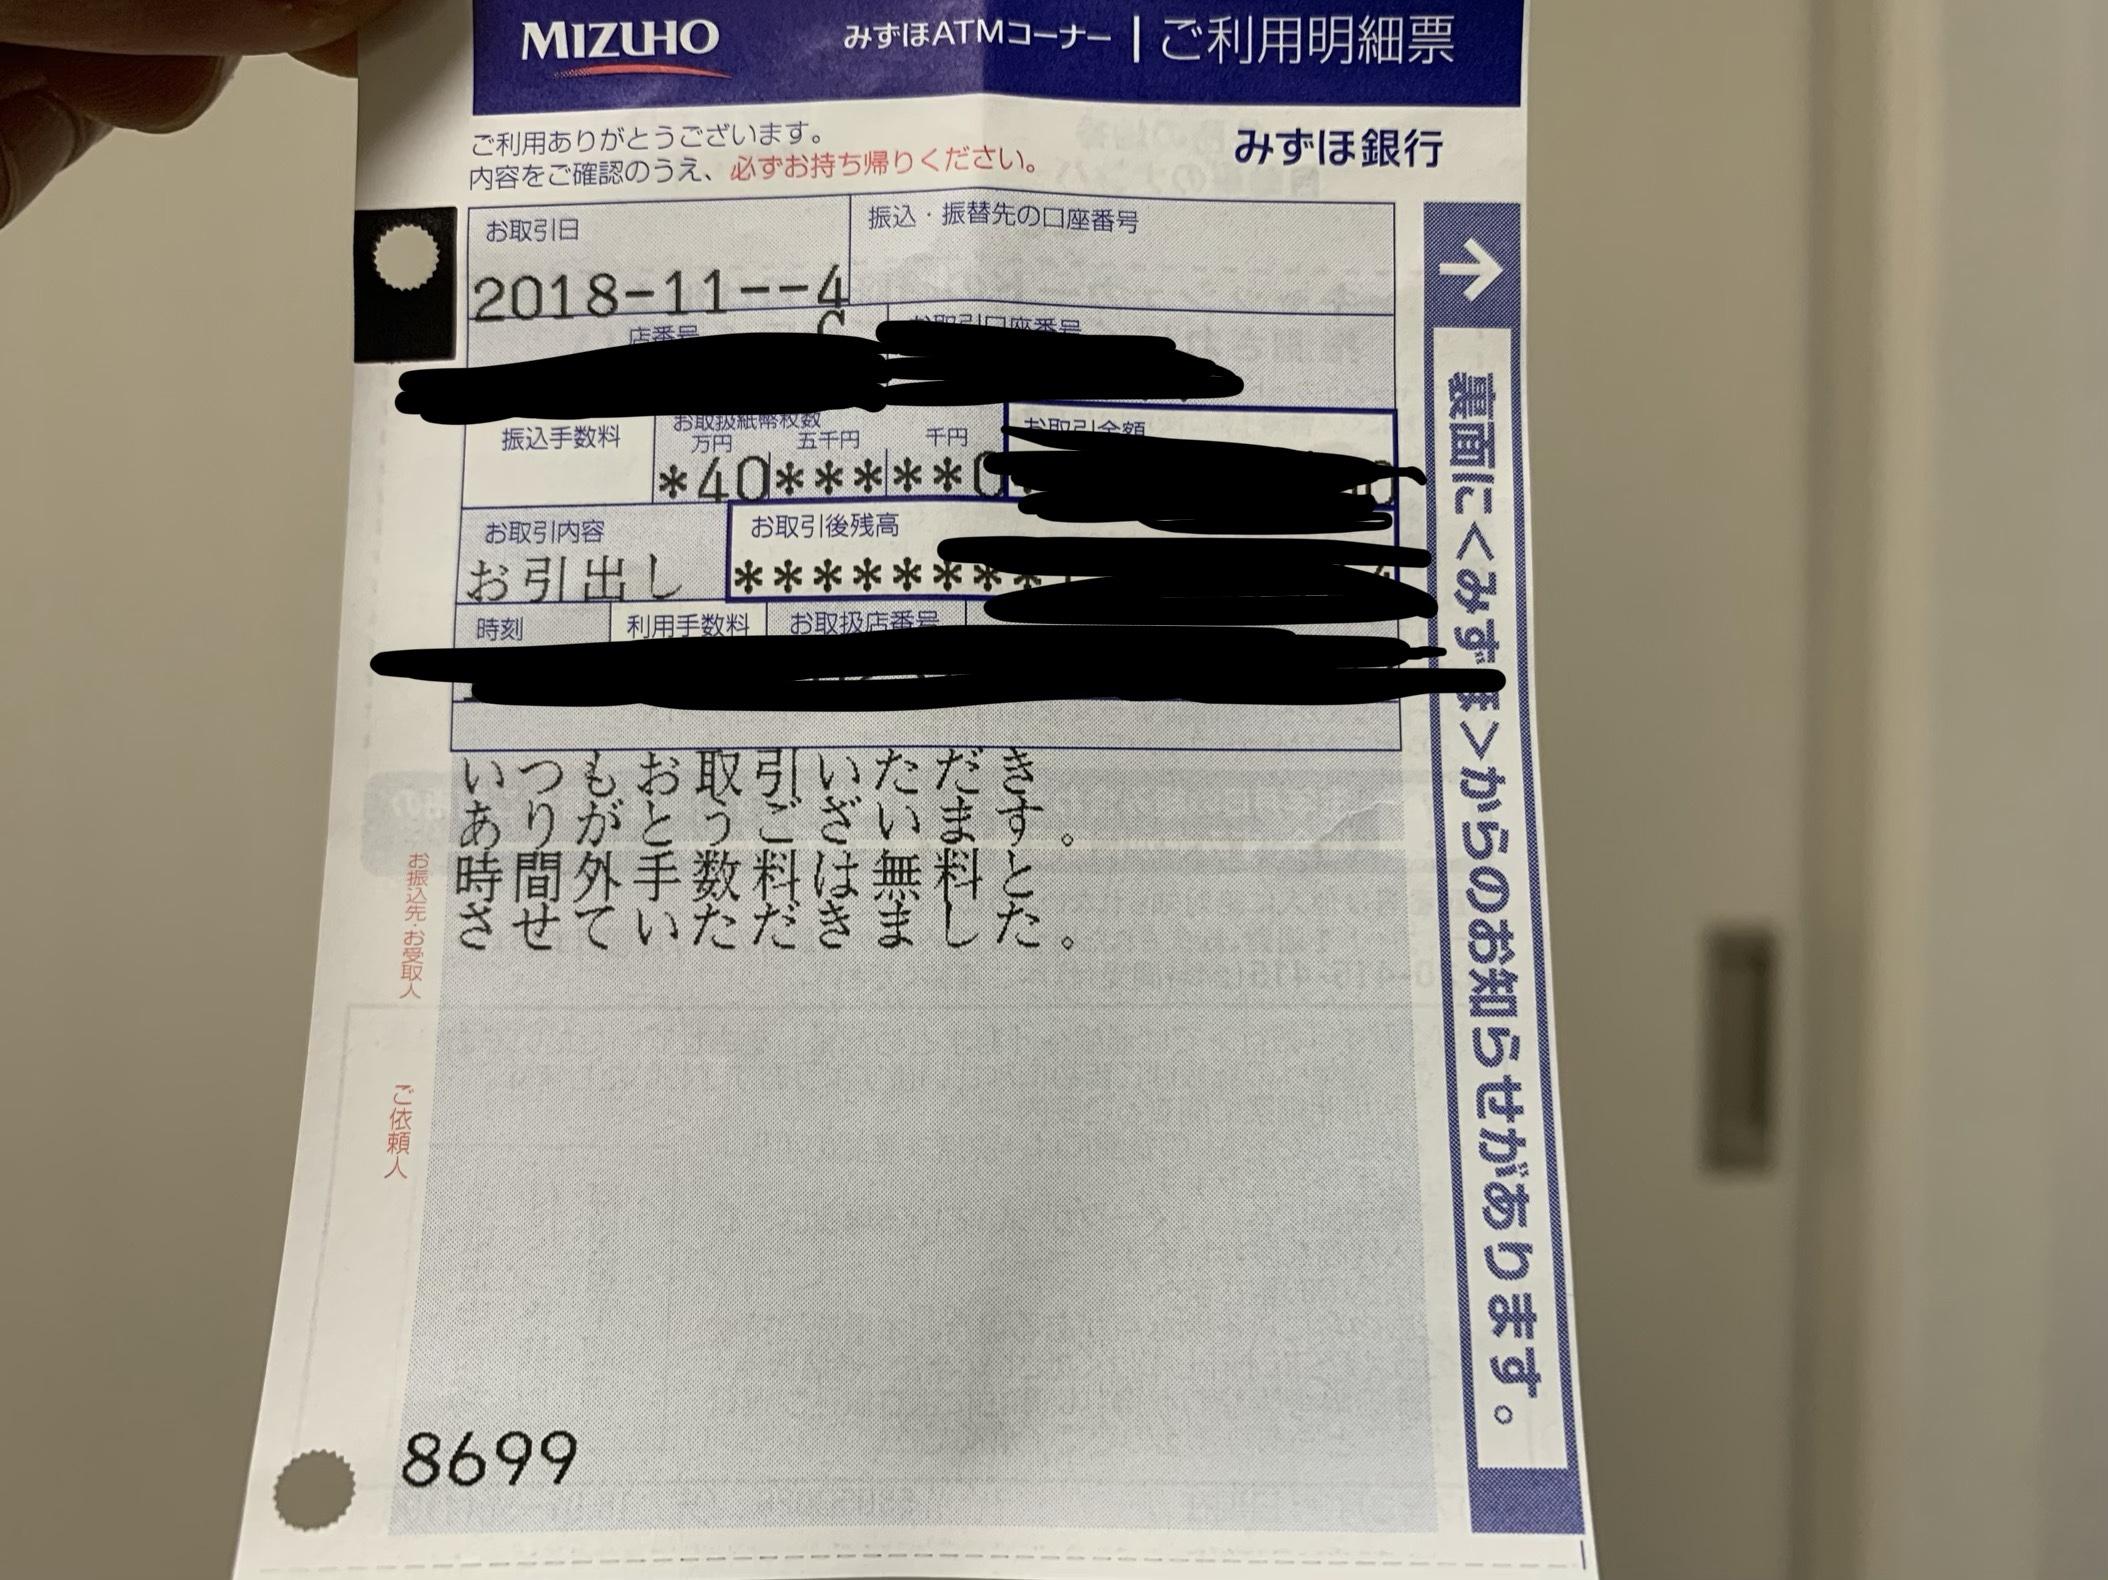 Atm 振込 銀行 手数料 みずほ